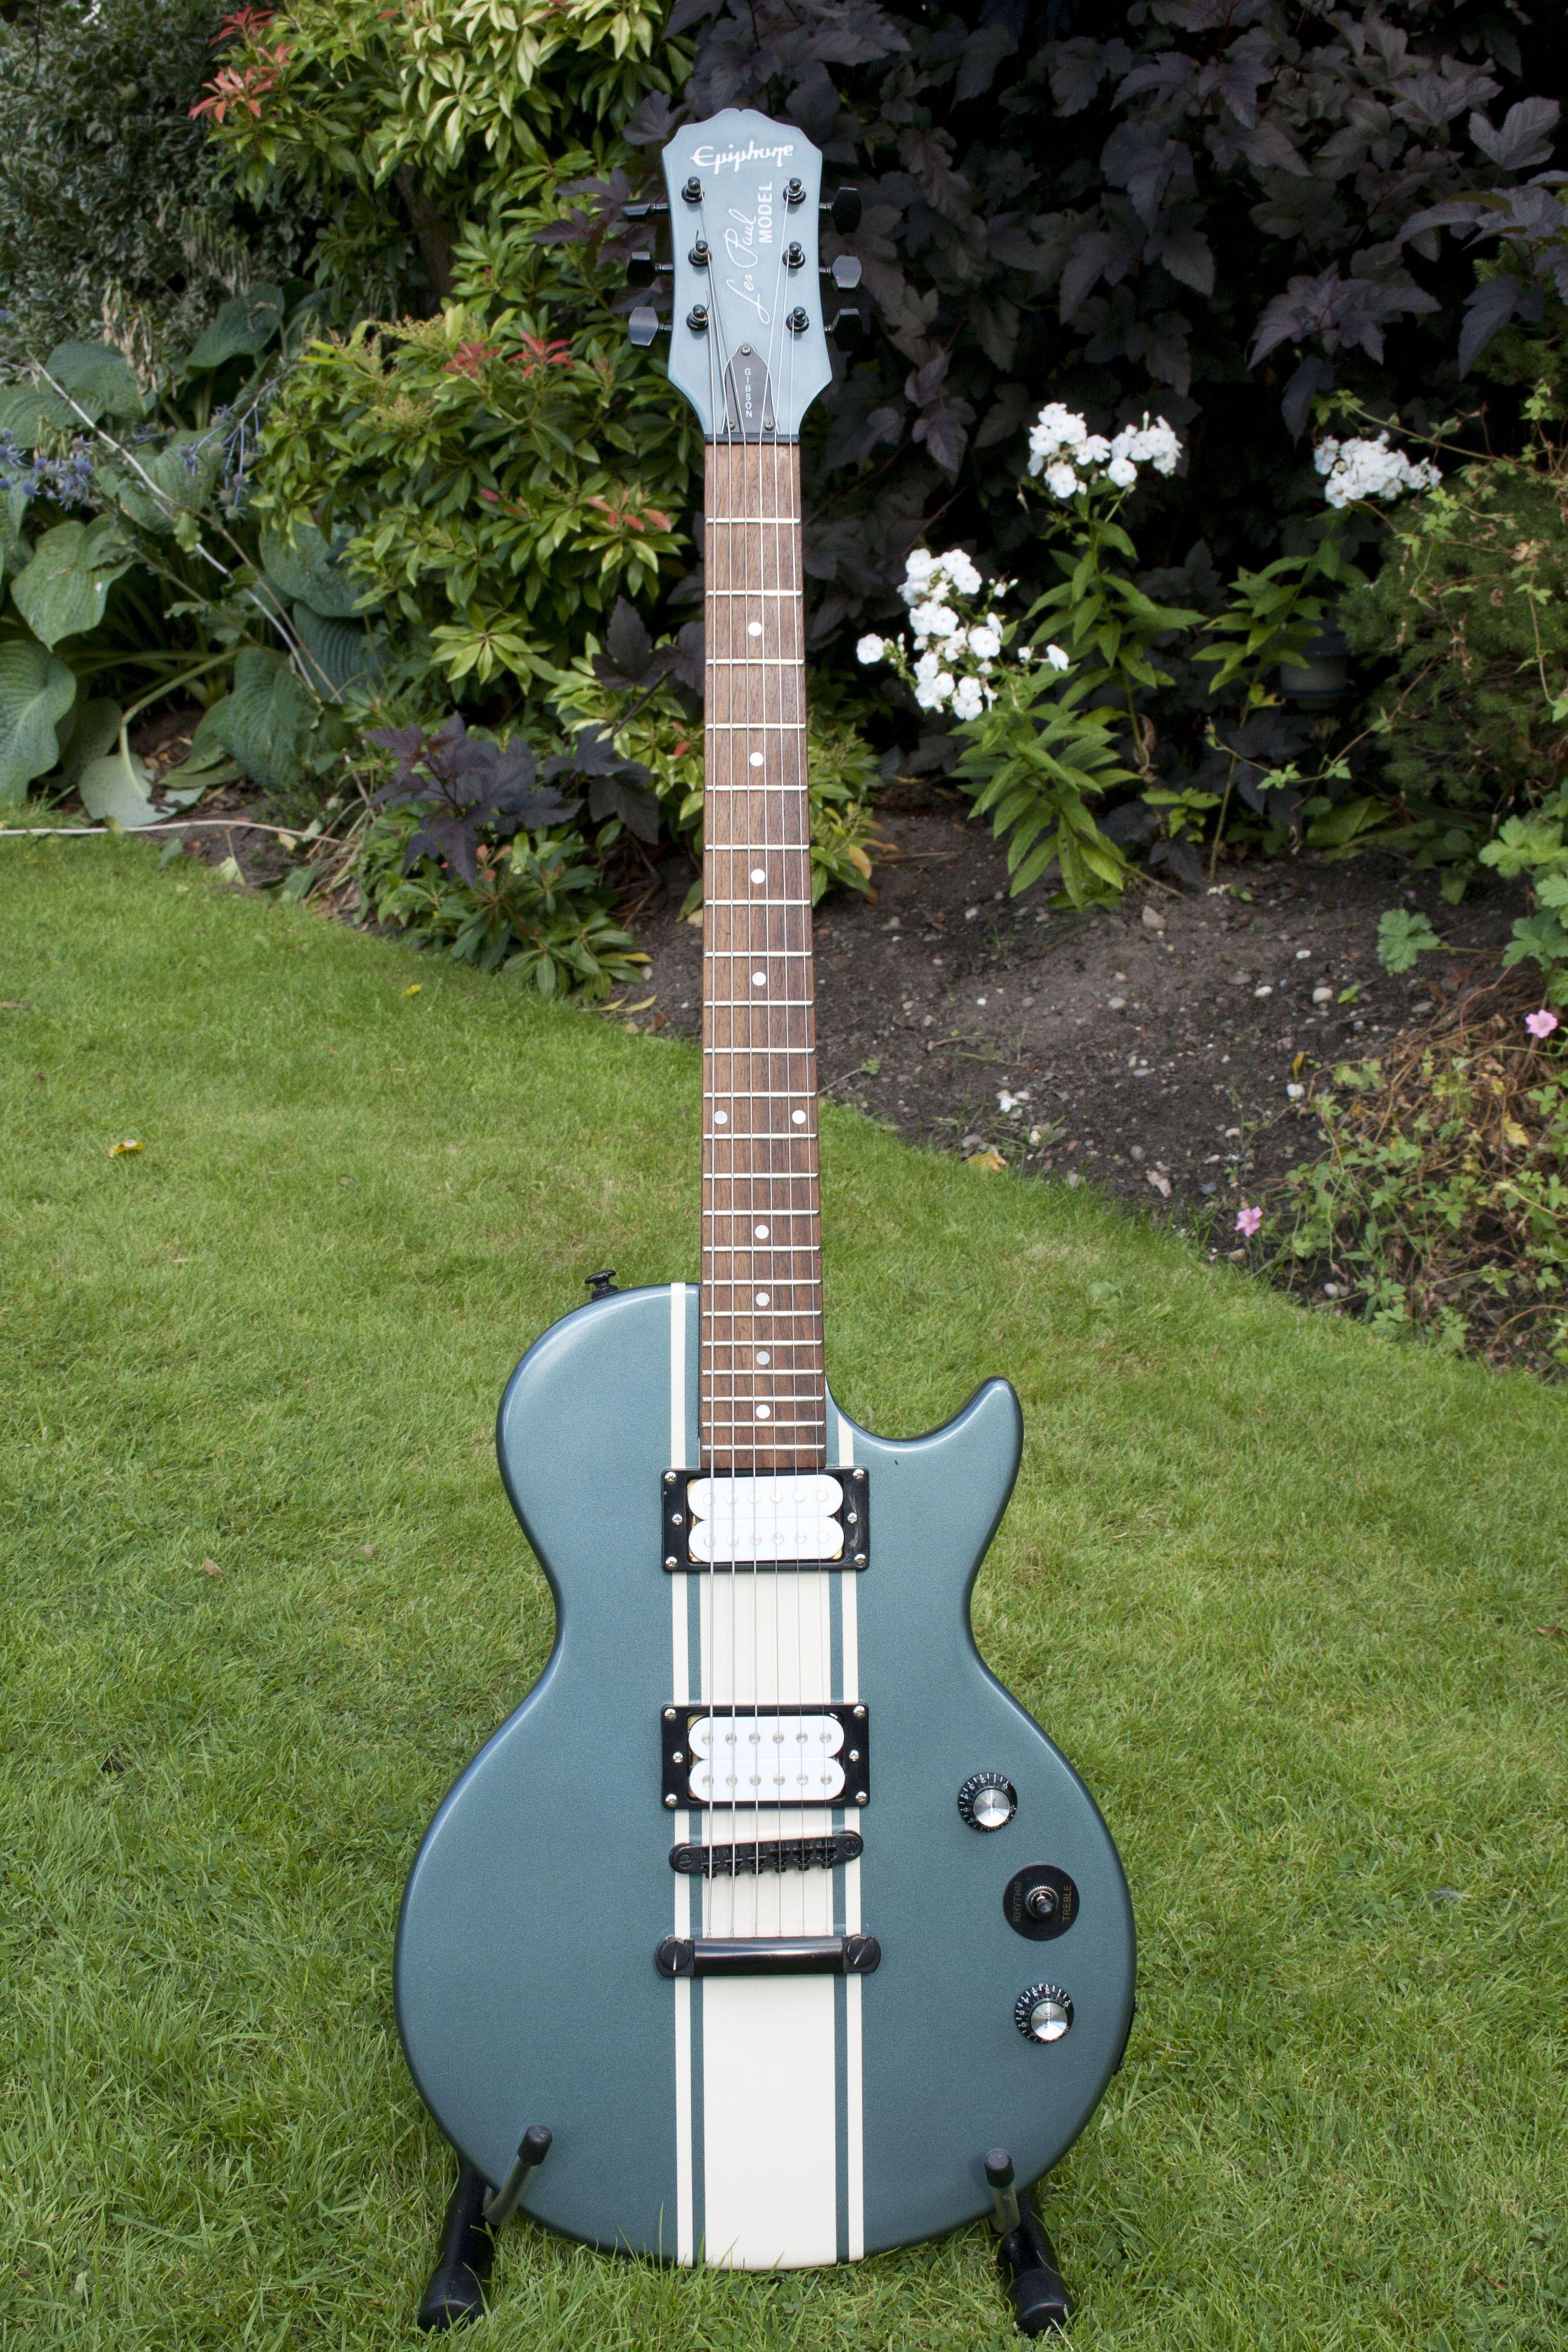 dlp epiphone les paul custom paint job electric guitar in 2019 guitar painting guitar. Black Bedroom Furniture Sets. Home Design Ideas